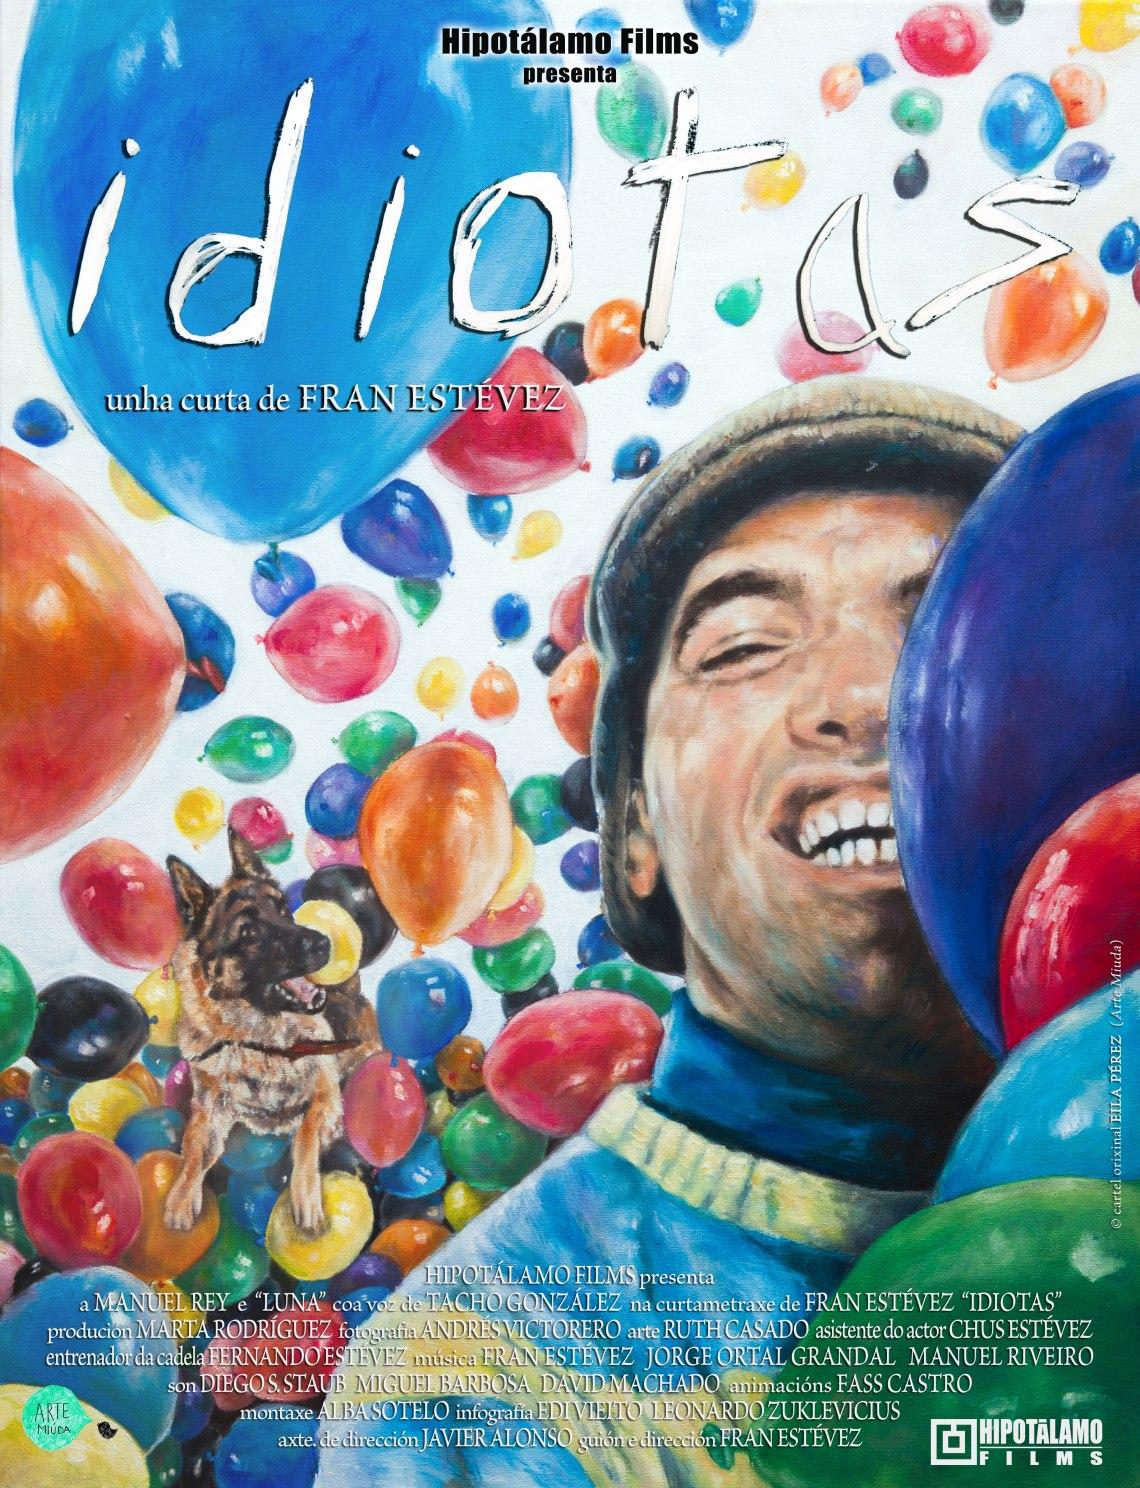 Cartel cortometraje Idiotas por Eila Pérez, de Arte Miúda.